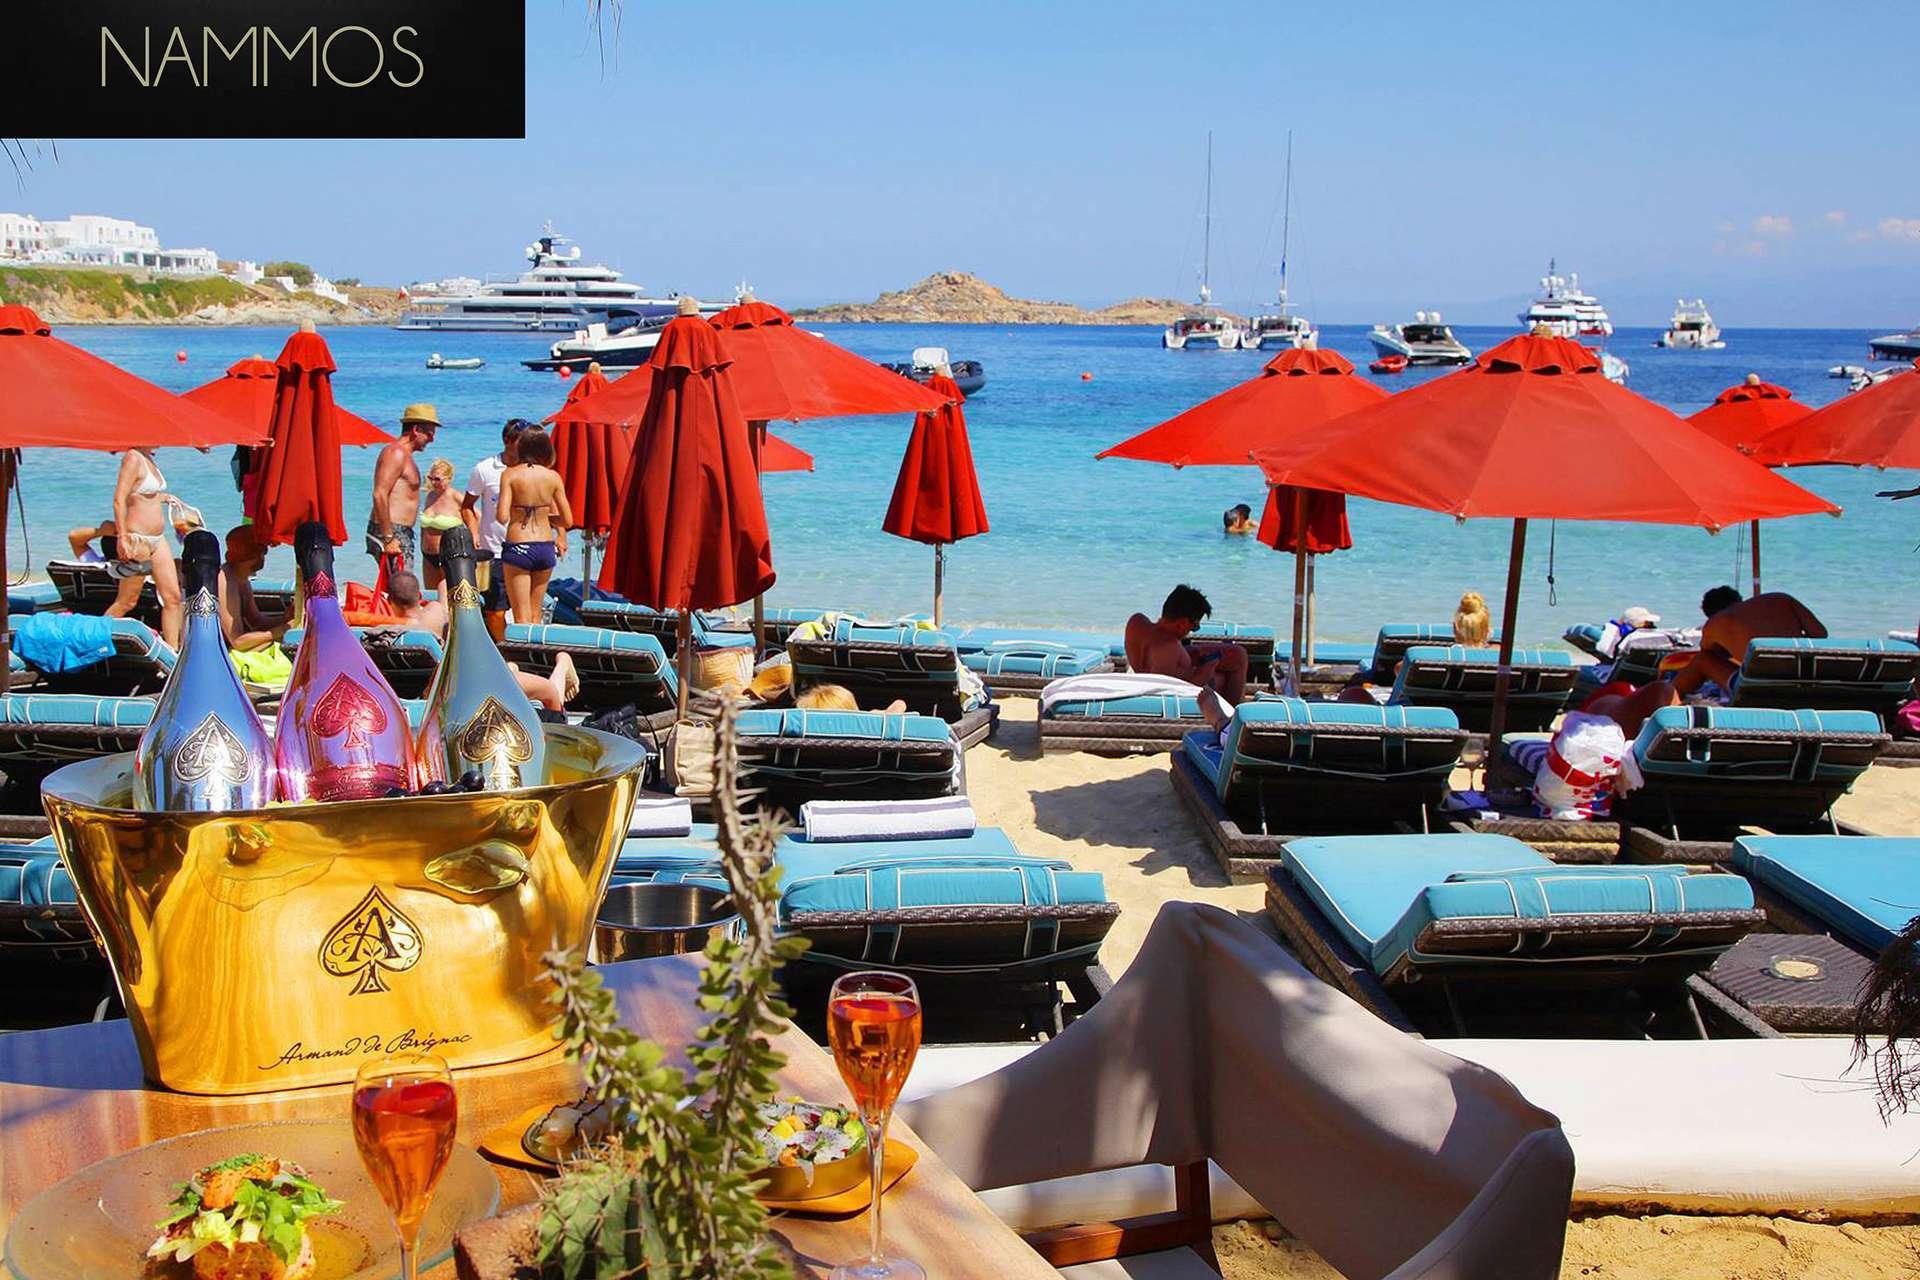 mykonos-restaurants-nammos-mykonos-restaurant-by-the-sea